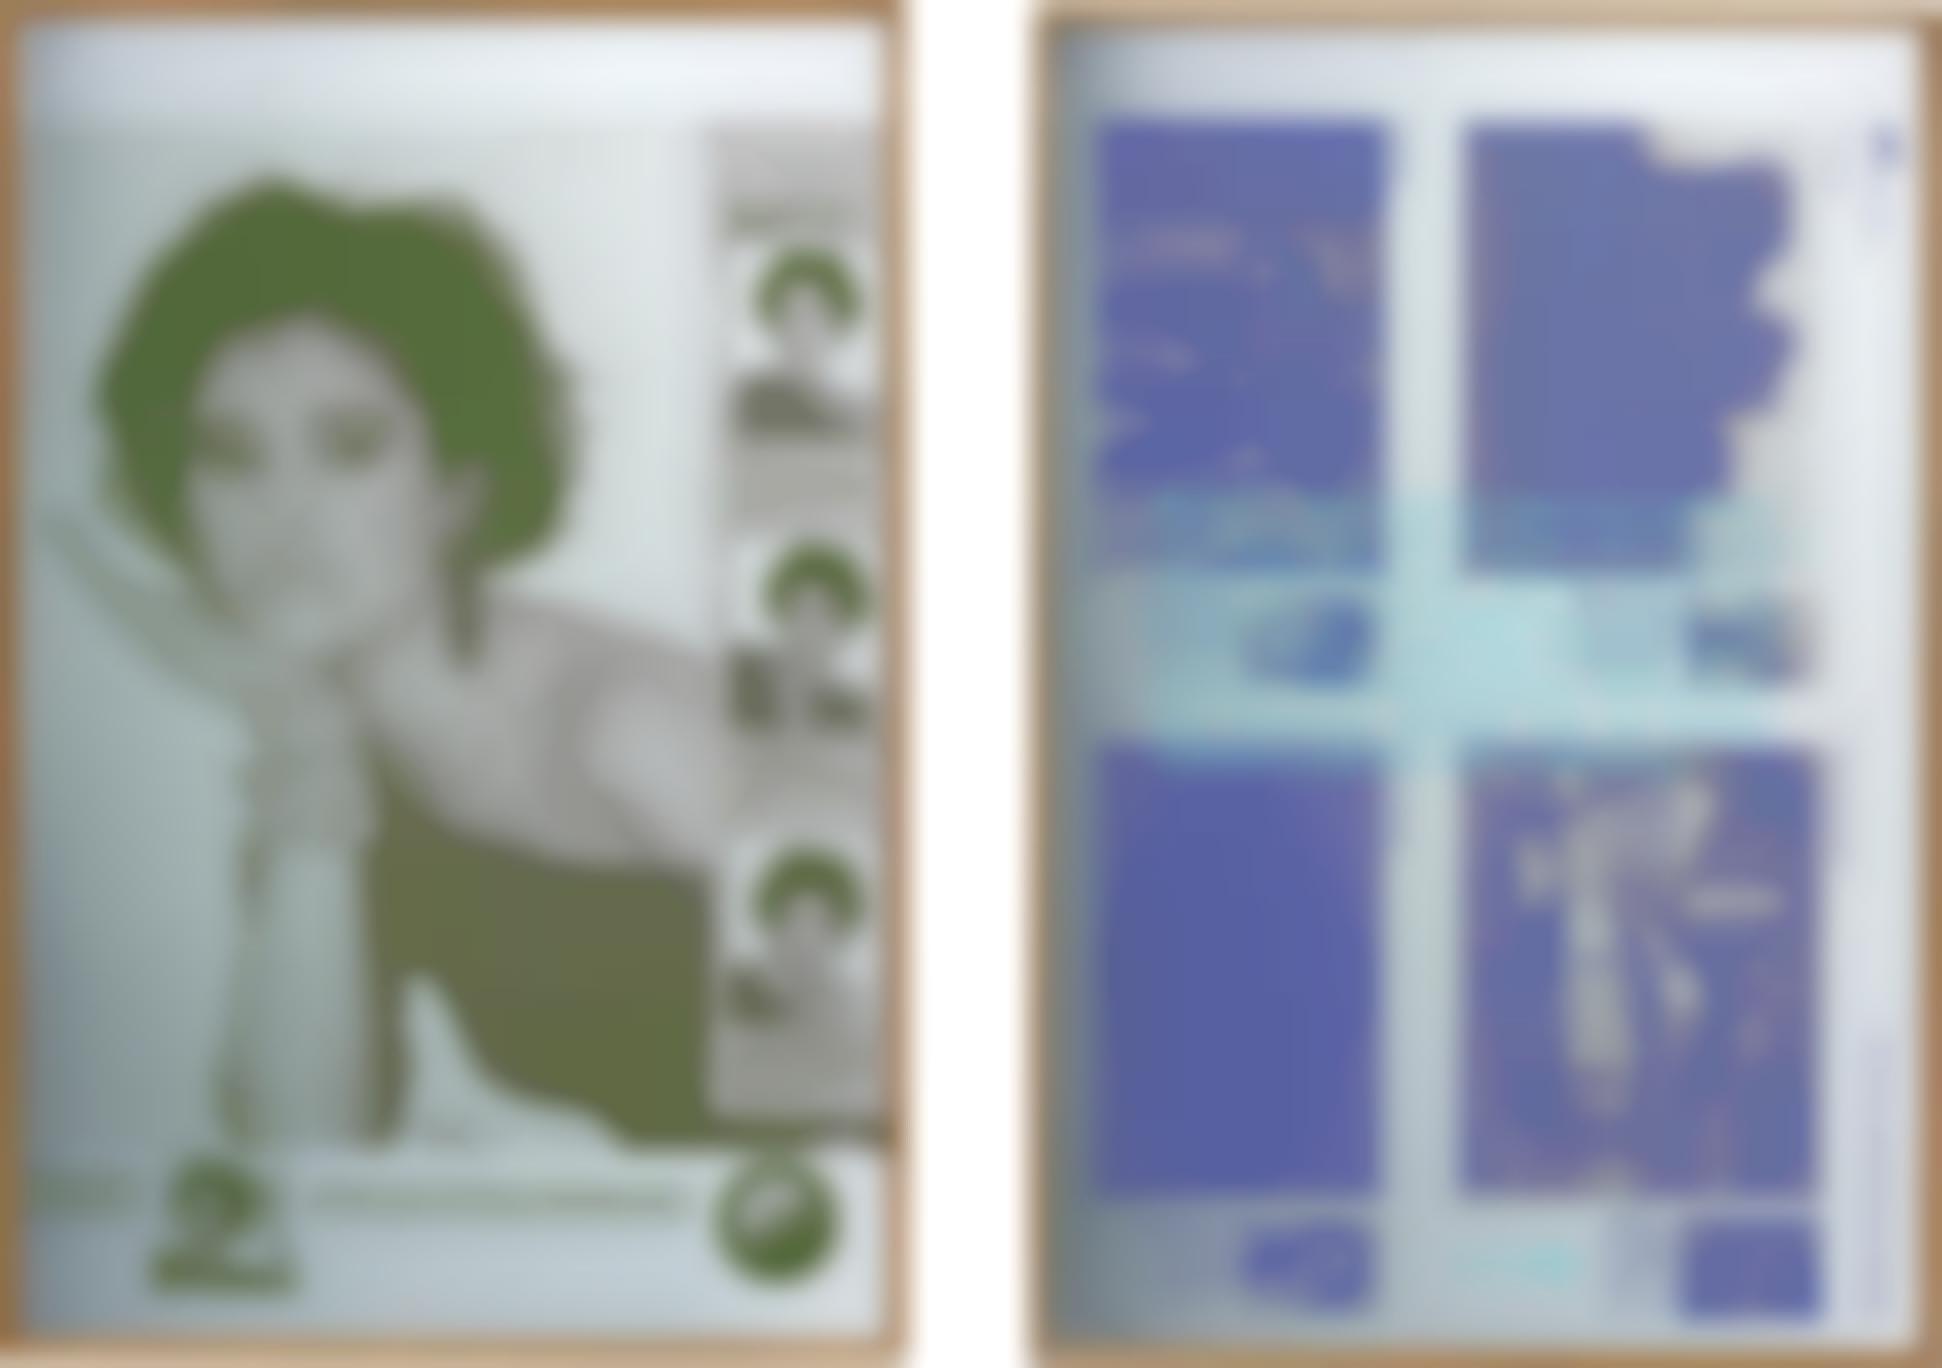 Martin Kippenberger-Two works: (i) Untitled; (ii) Untitled-